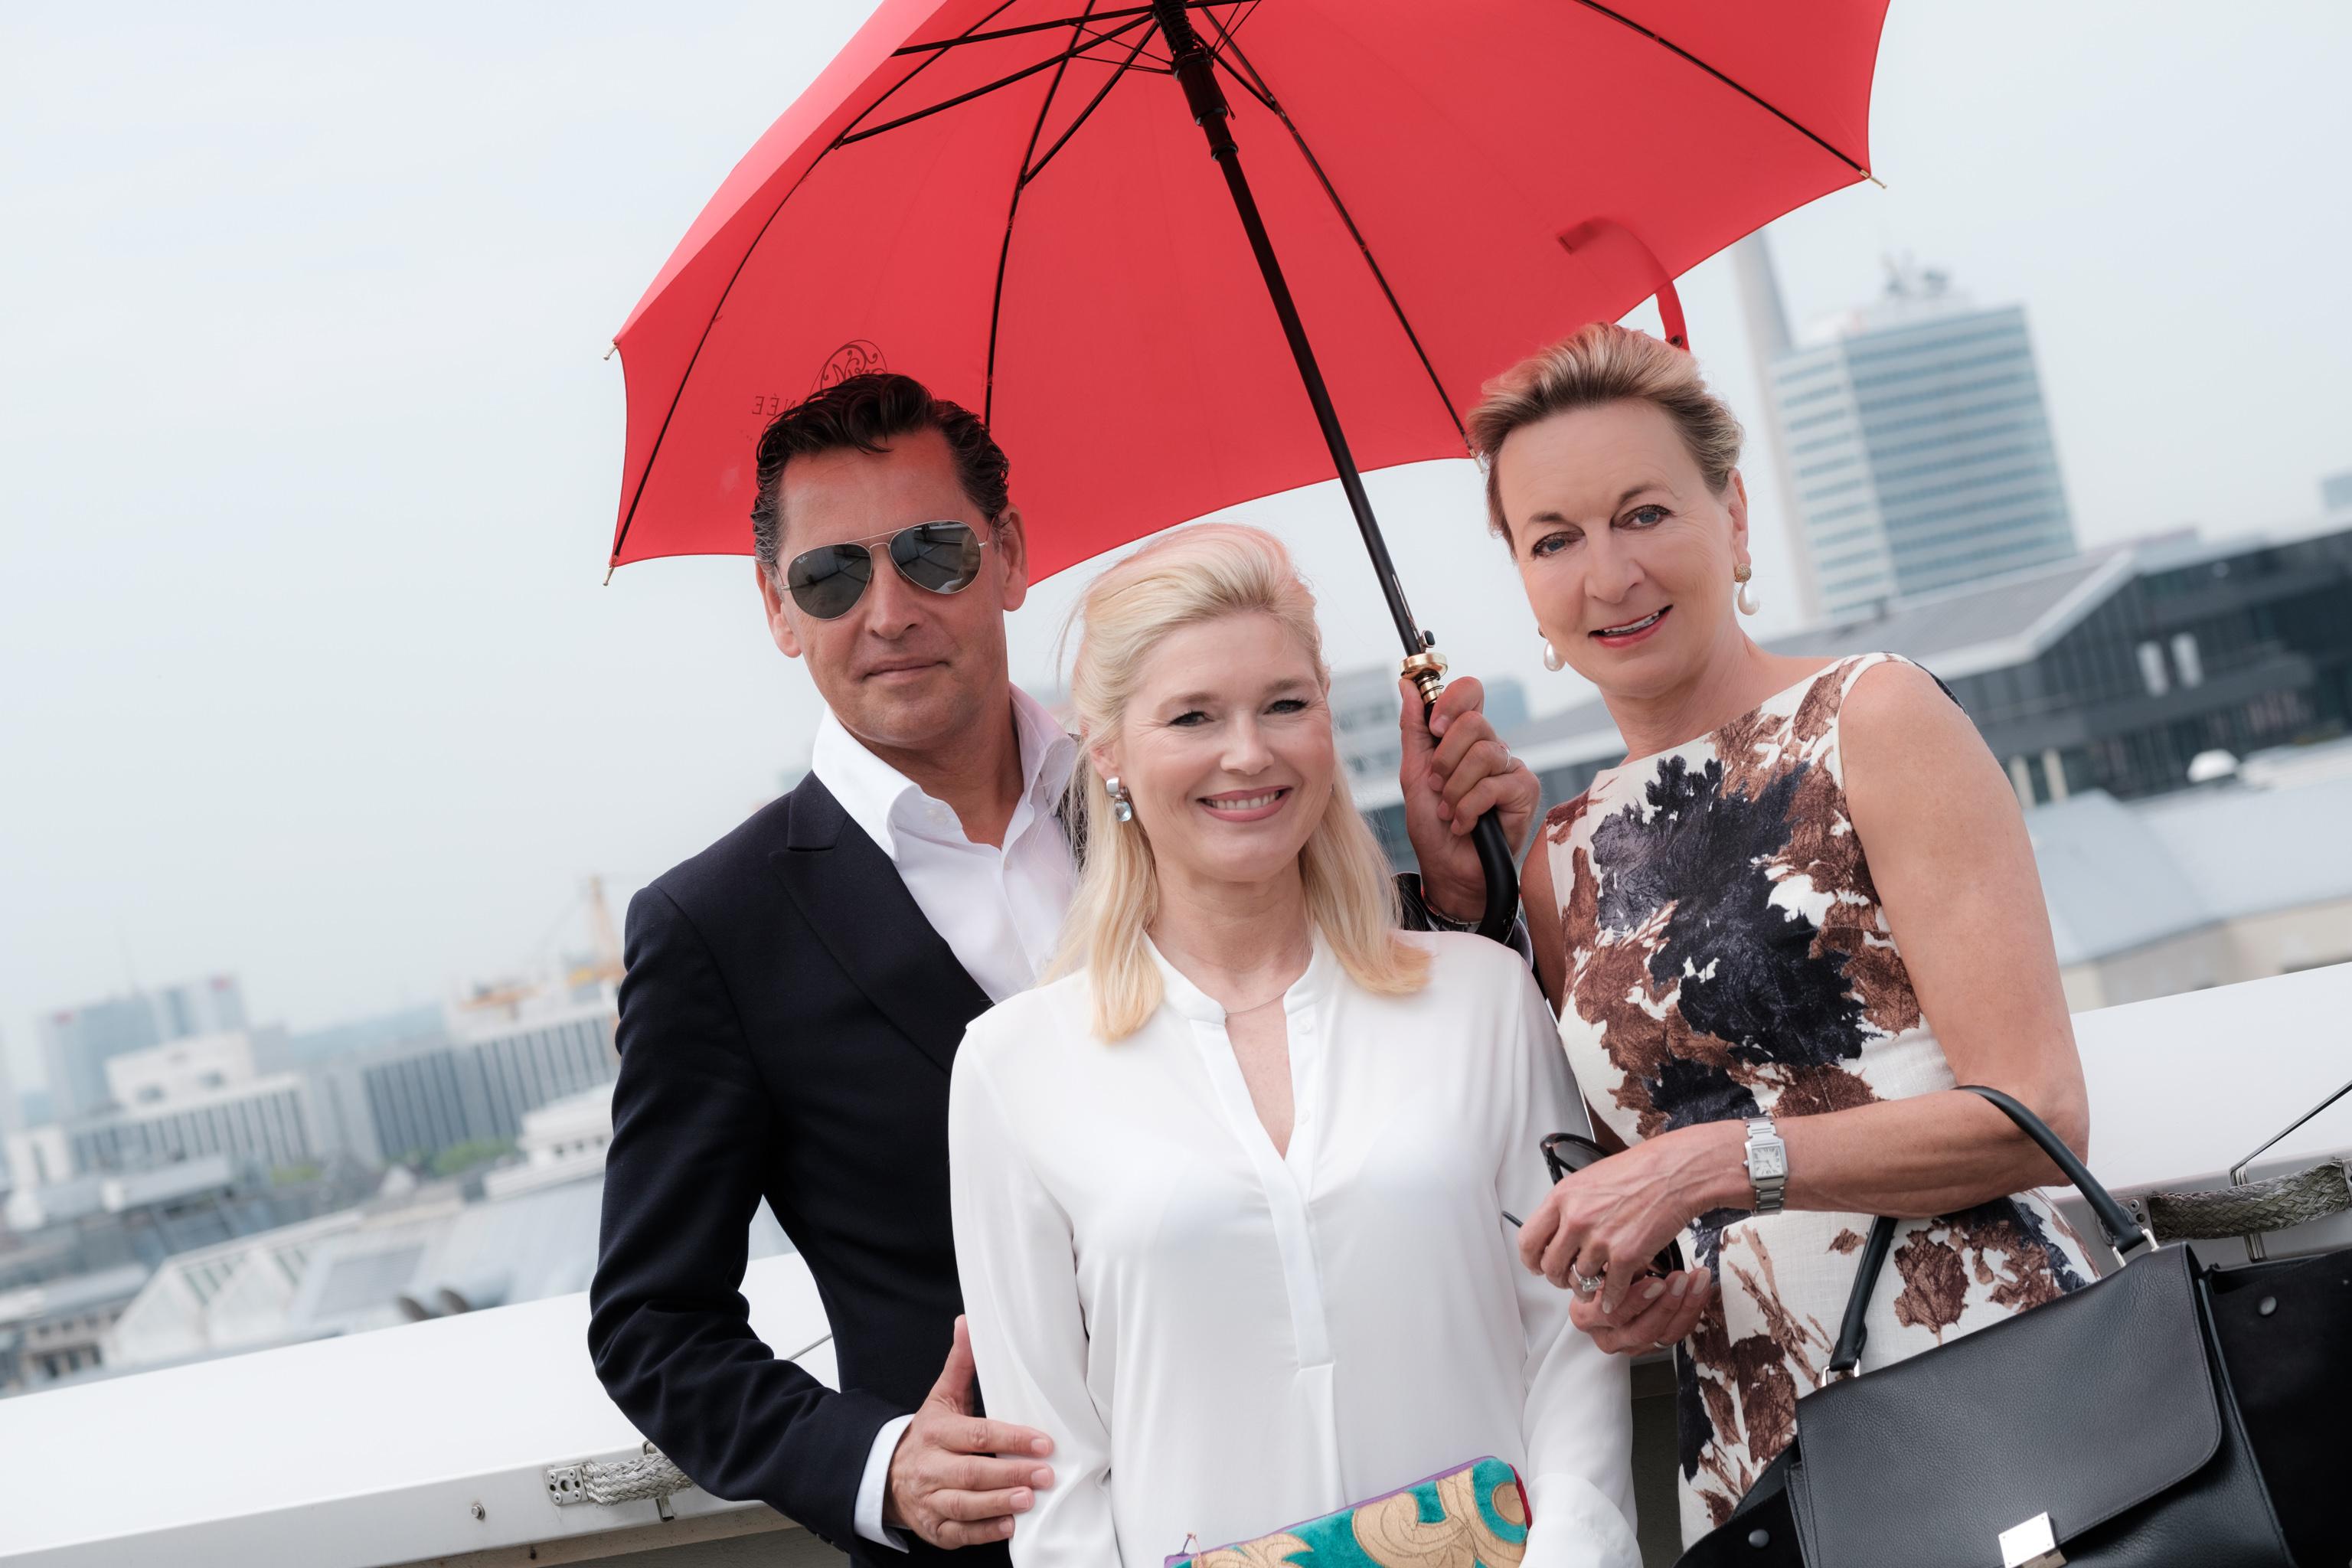 Stefan Asbrand-Eickhoff, Petra Dieners, Susanne Eickhoff, Susanne Asbrand-Eickhoff, Fashion-Blog, Lieblingsstil.com, 5,